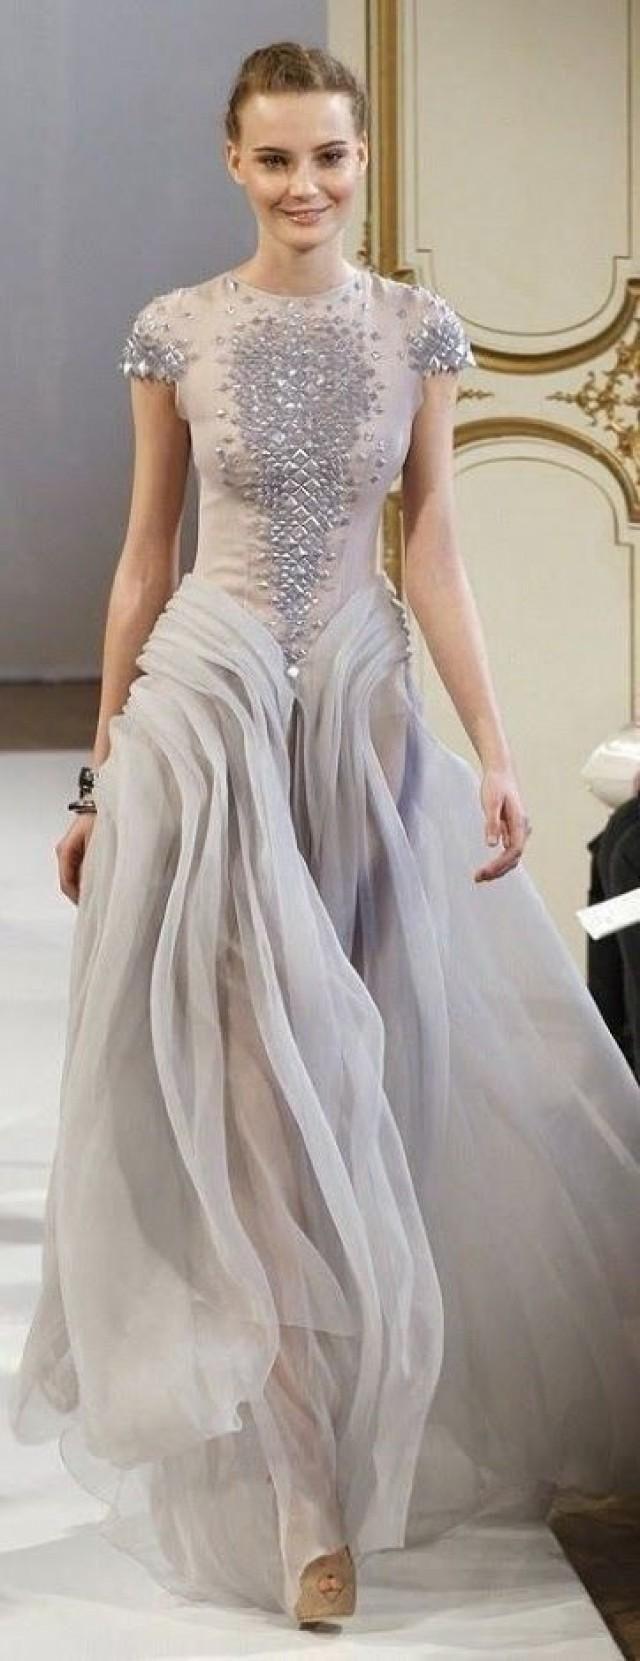 37574 best fairytales images on pinterest for Wedding dresses for big hips